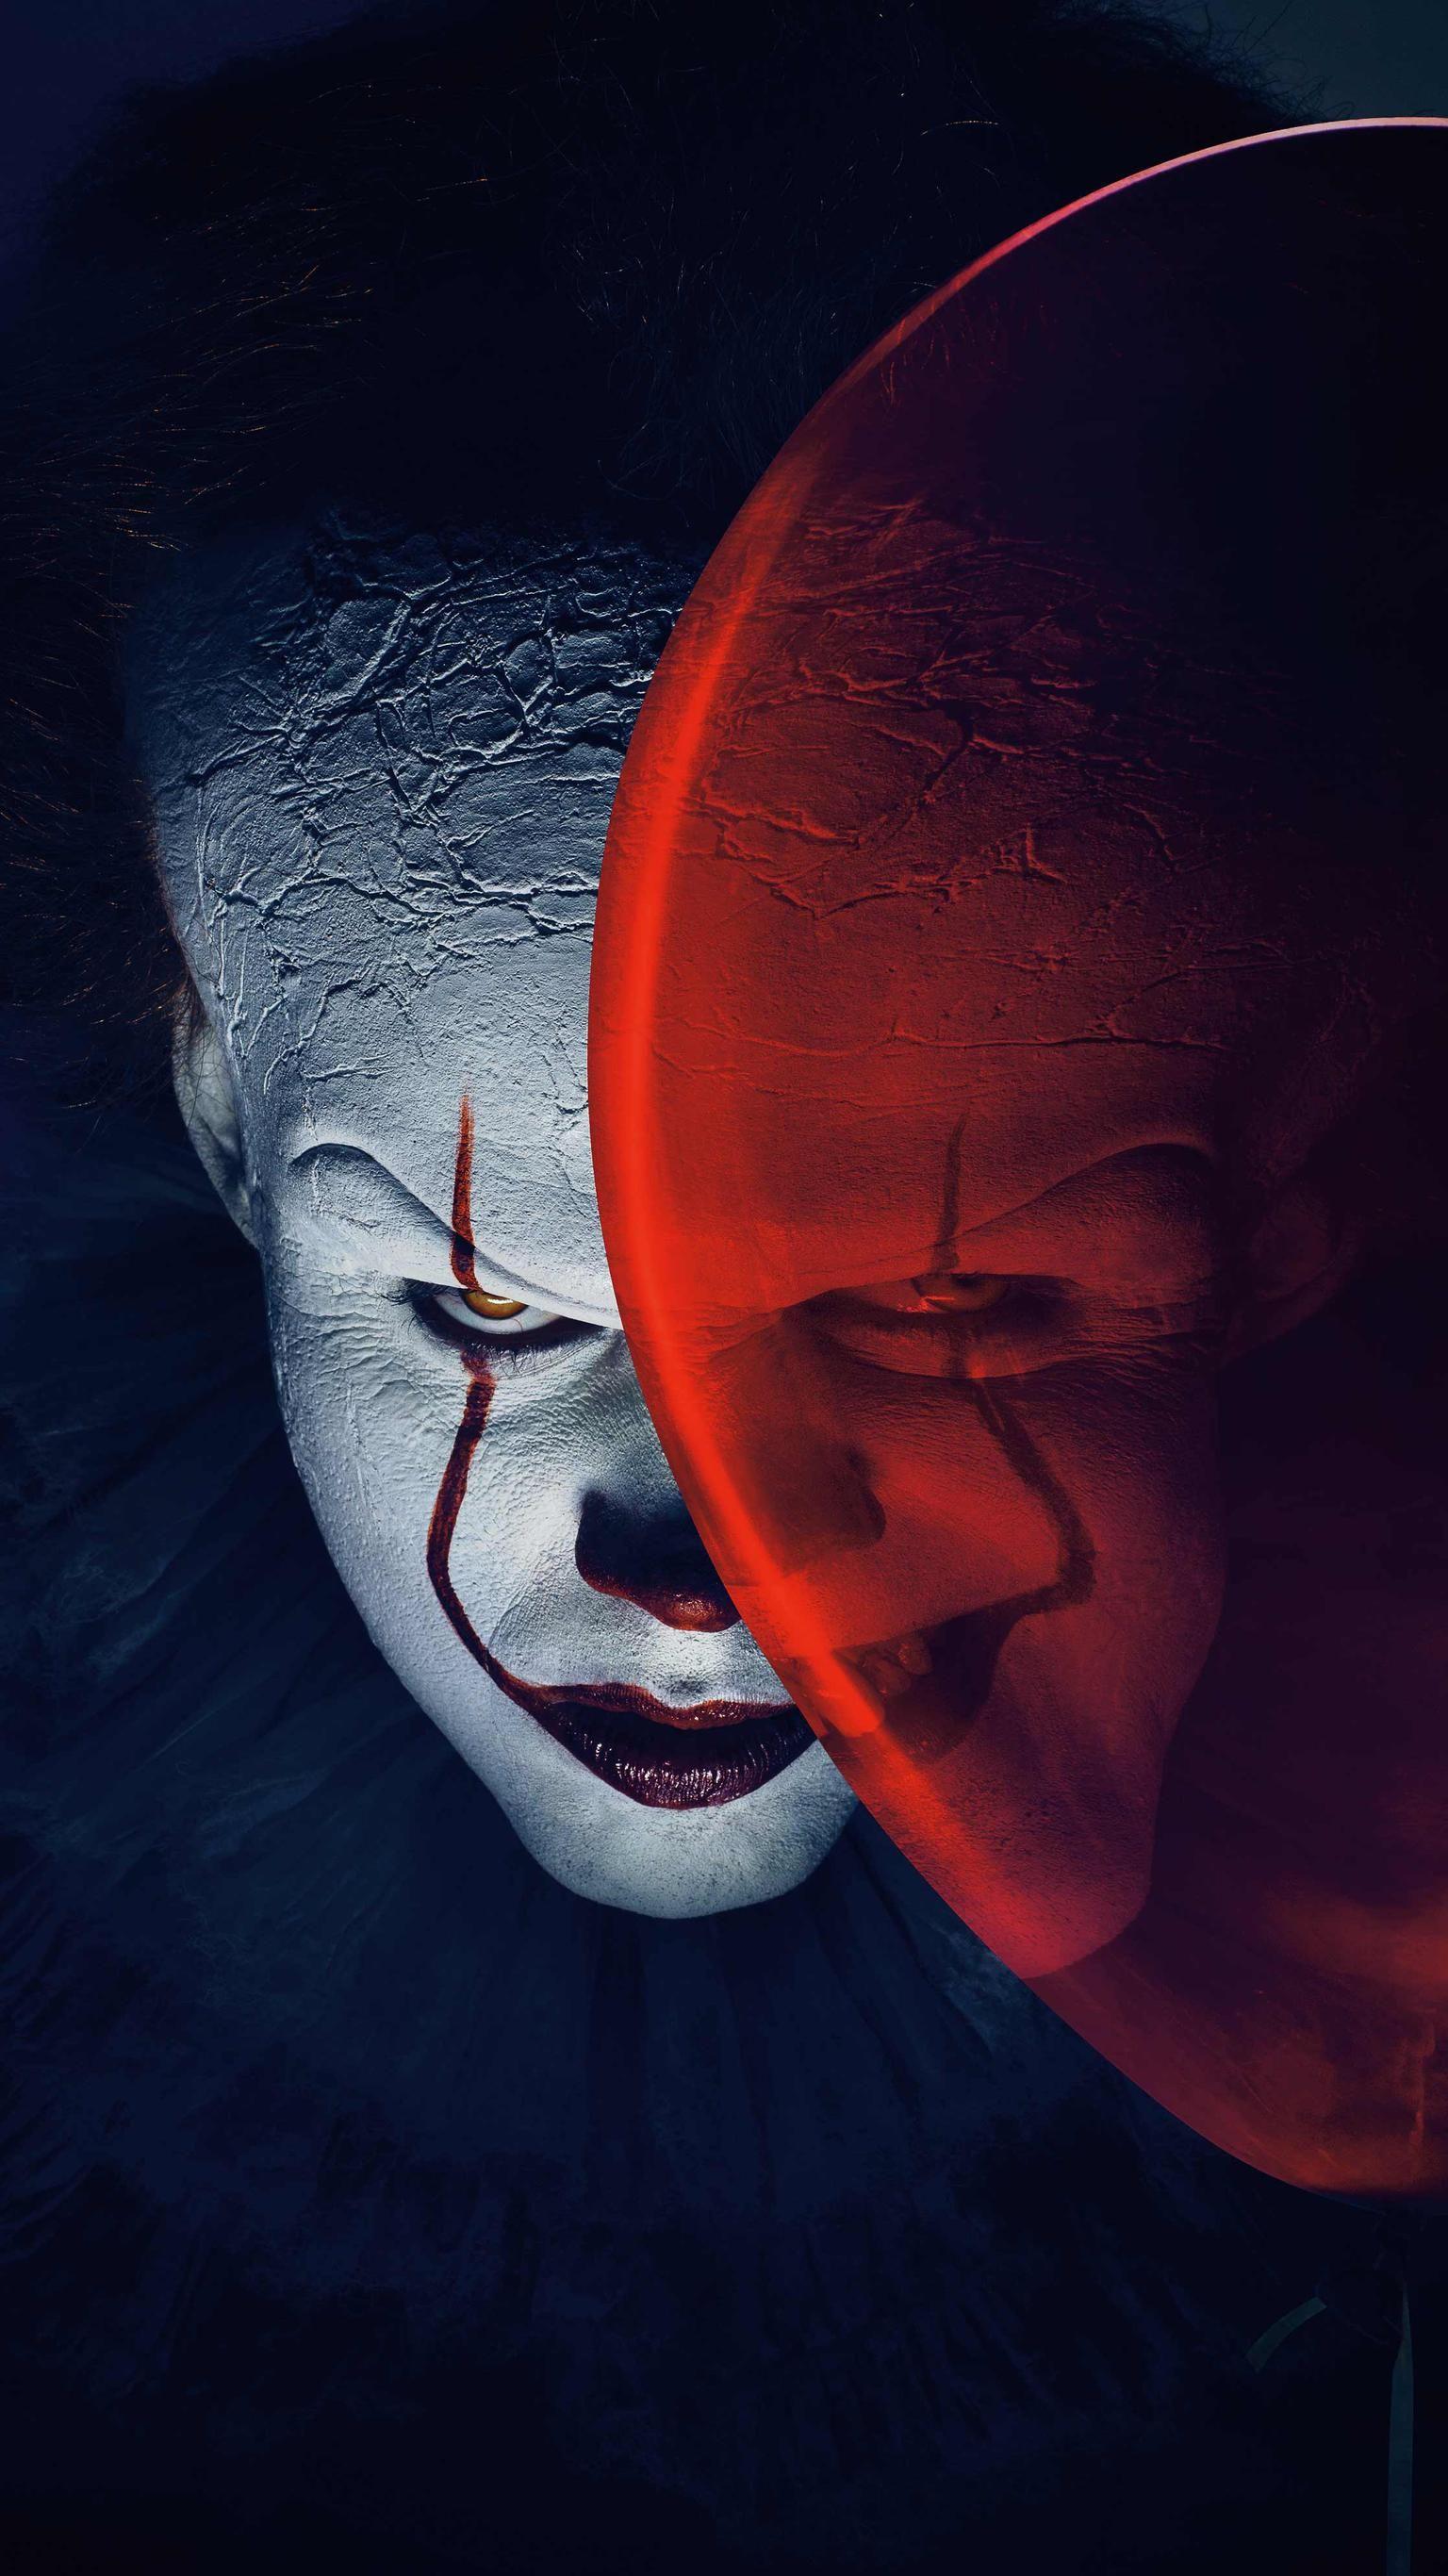 It 2017 Phone Wallpaper Moviemania Scary Wallpaper Joker Iphone Wallpaper Movie Wallpapers